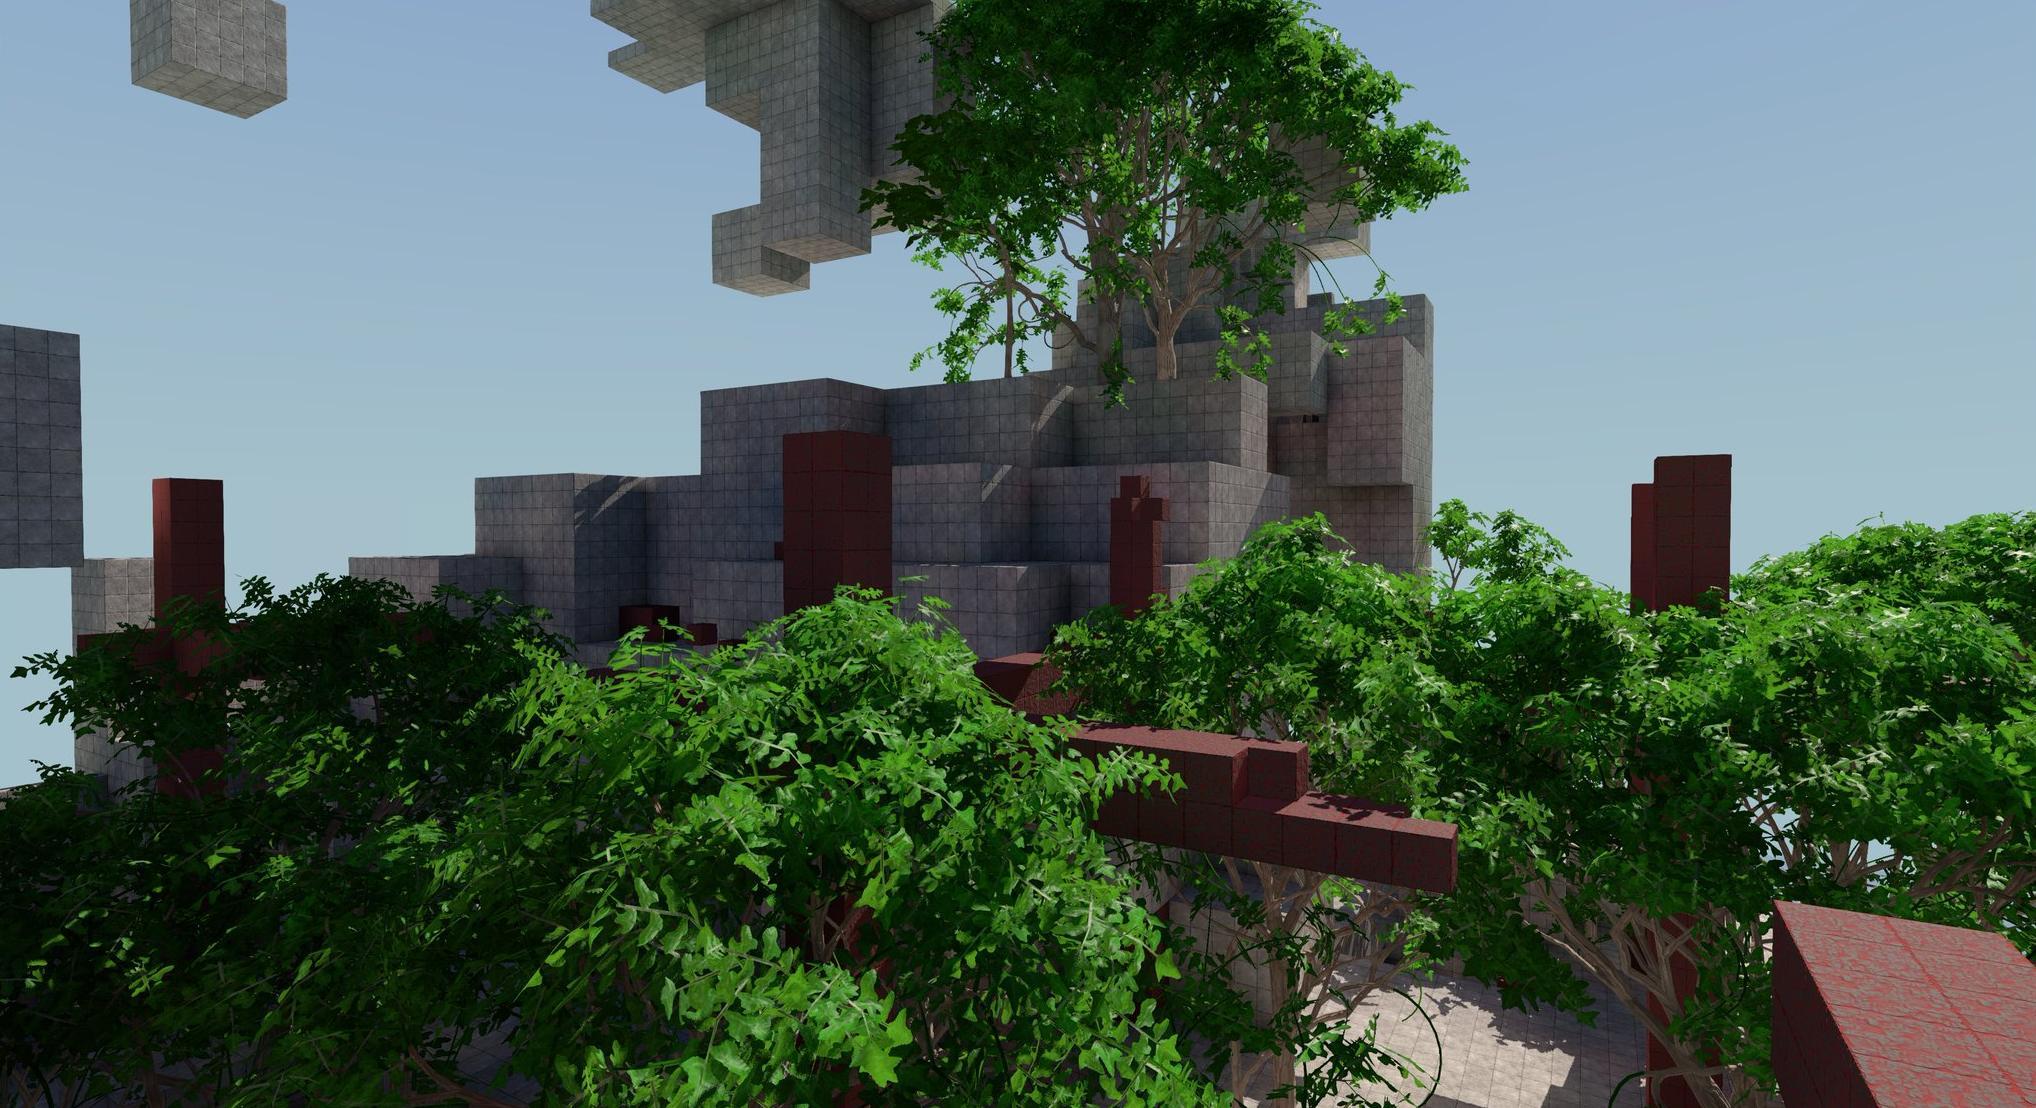 screenshot: concrete, trees, shadows